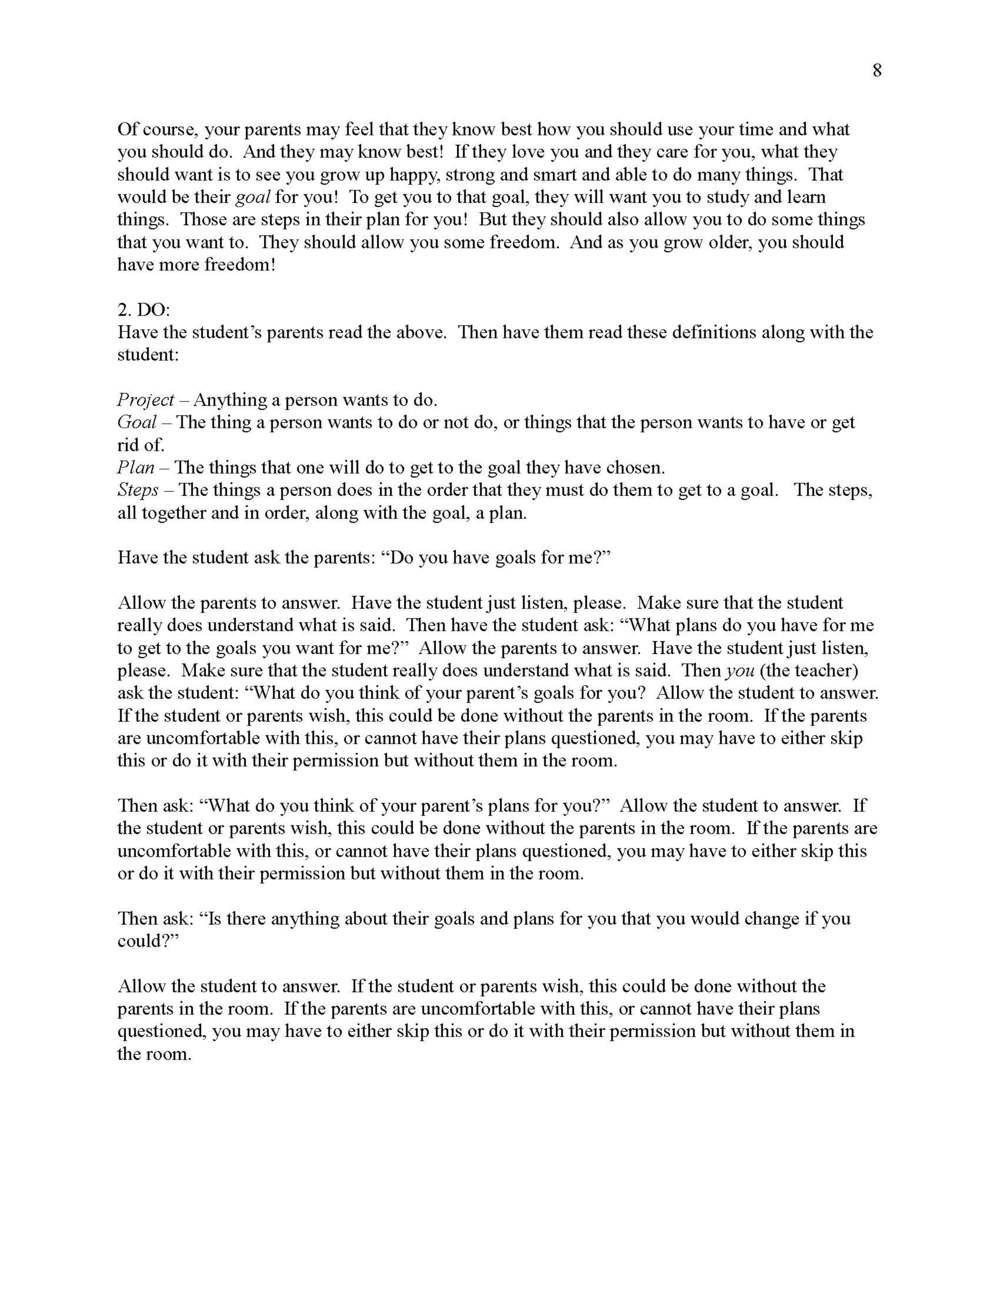 Step 1 Study & Life Skills 6 - Doing Plans_Page_09.jpg